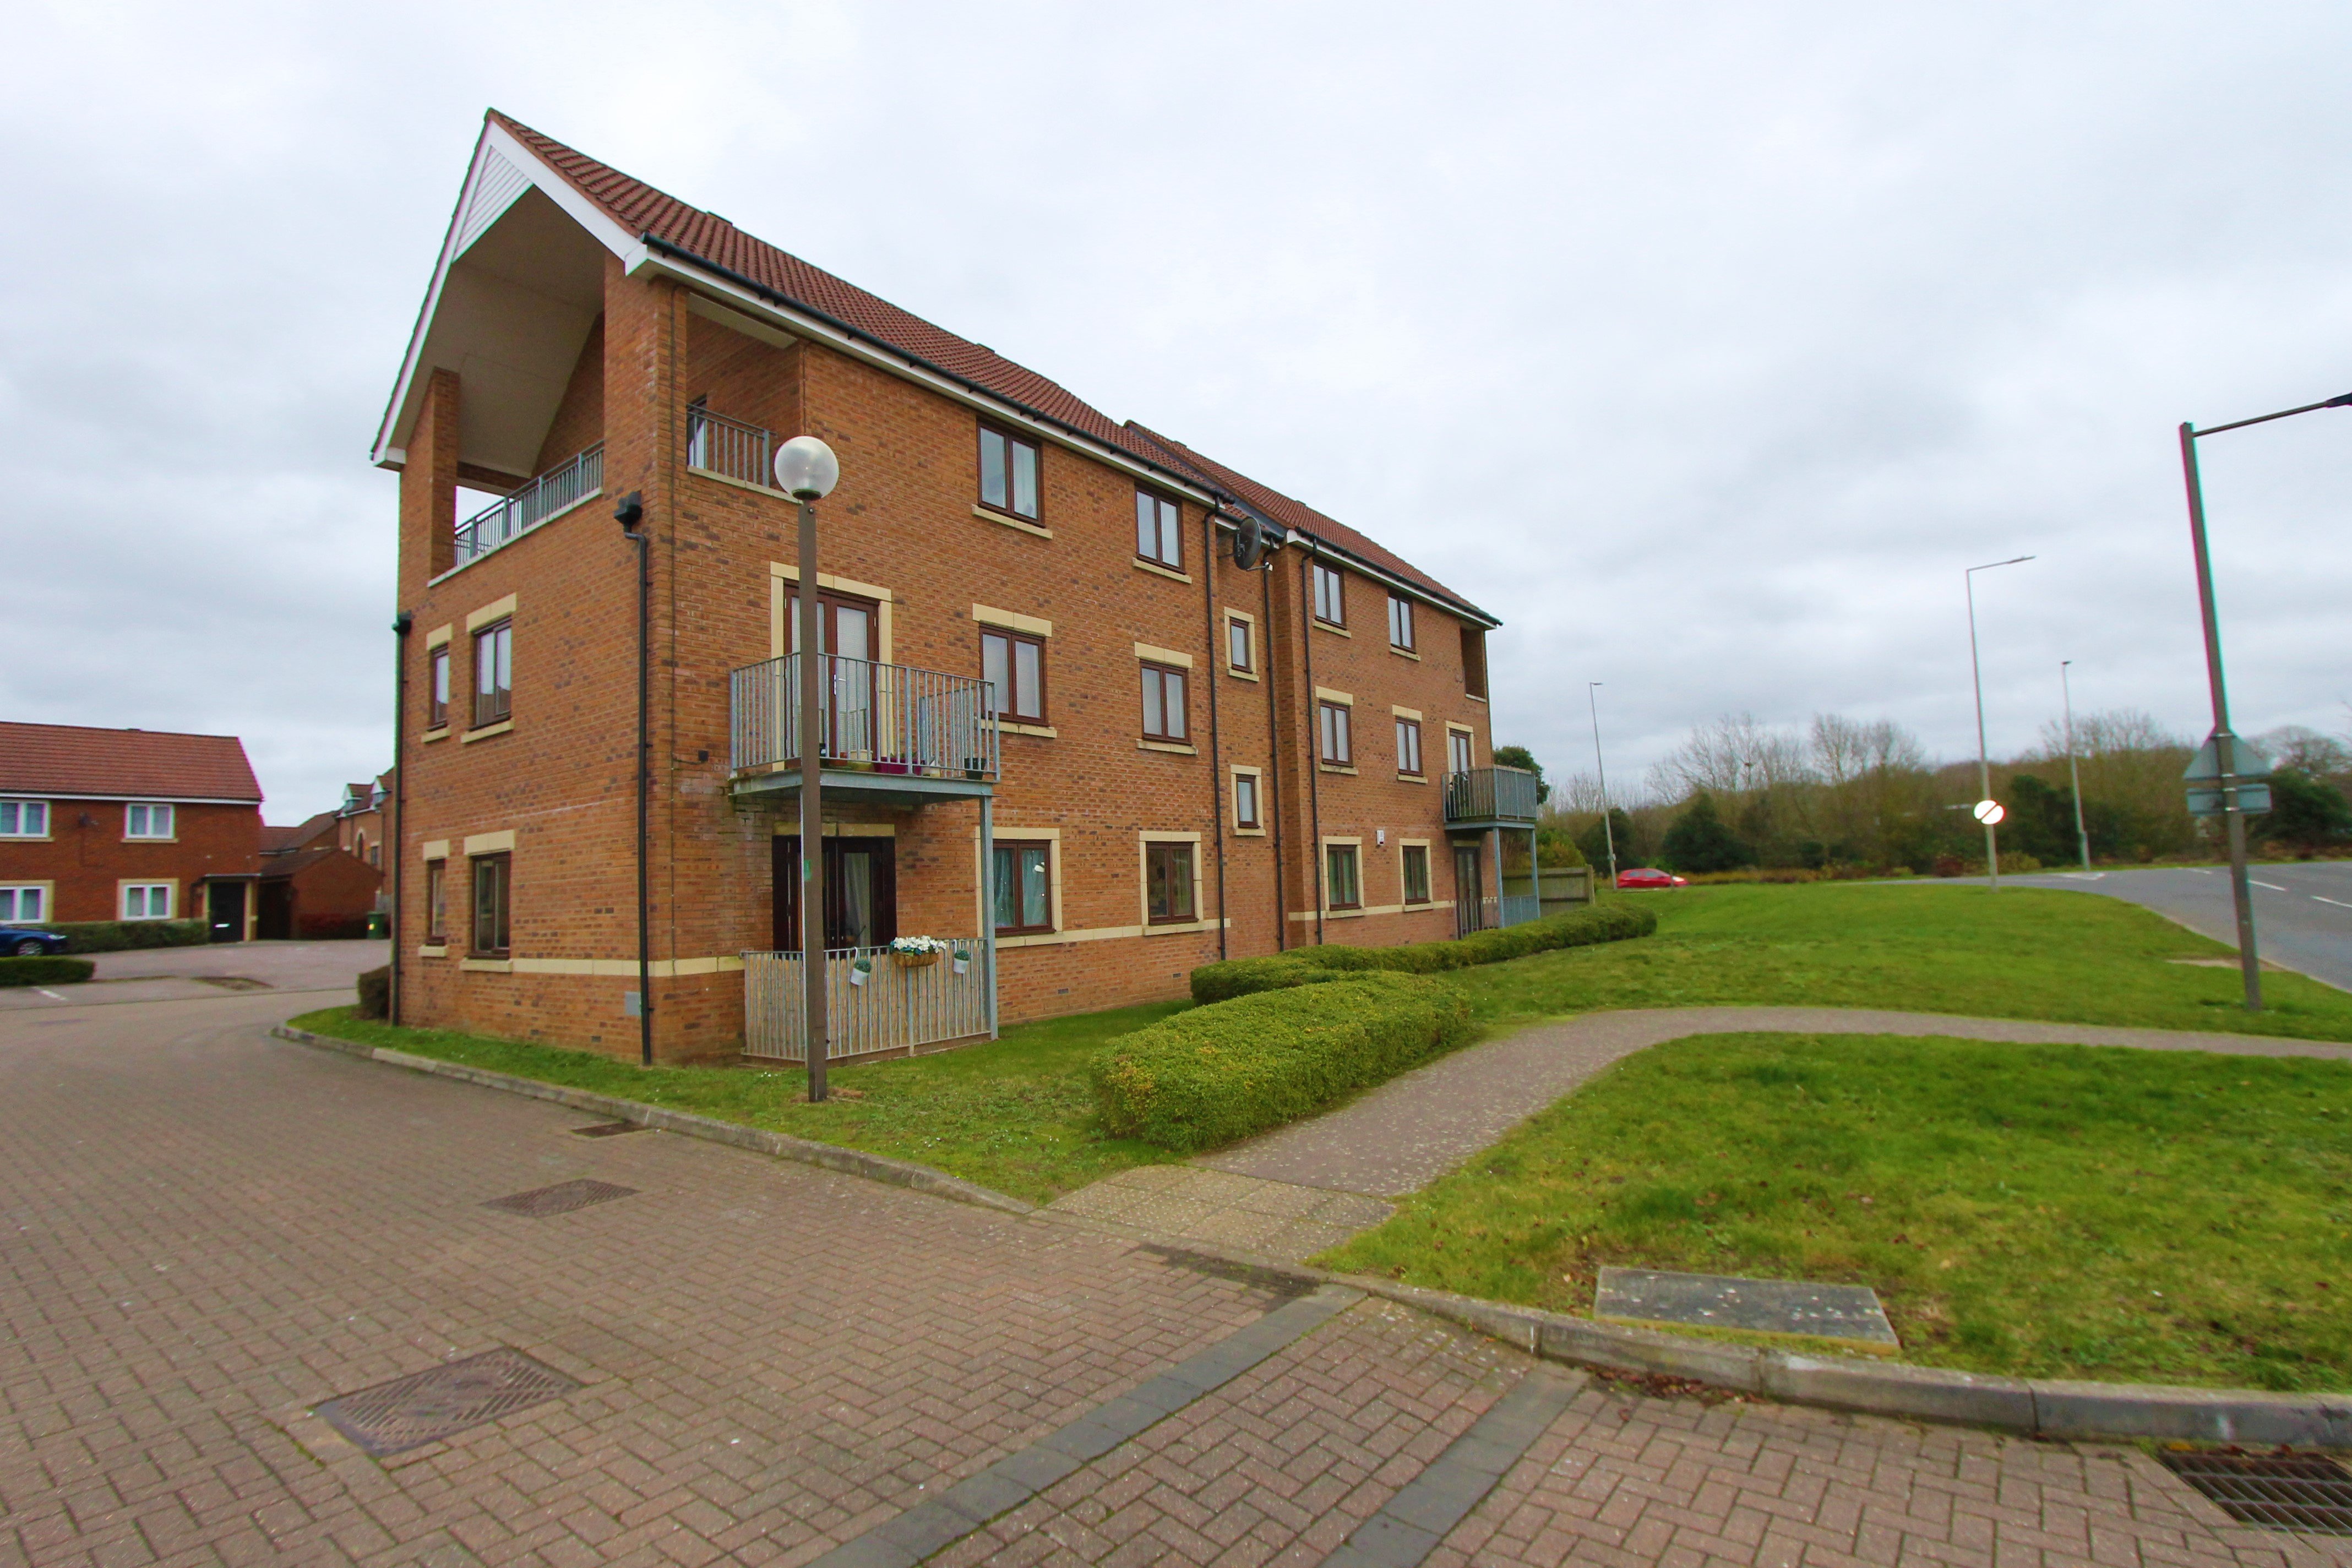 Heligan Place, Milton Keynes, Buckinghamshire Image